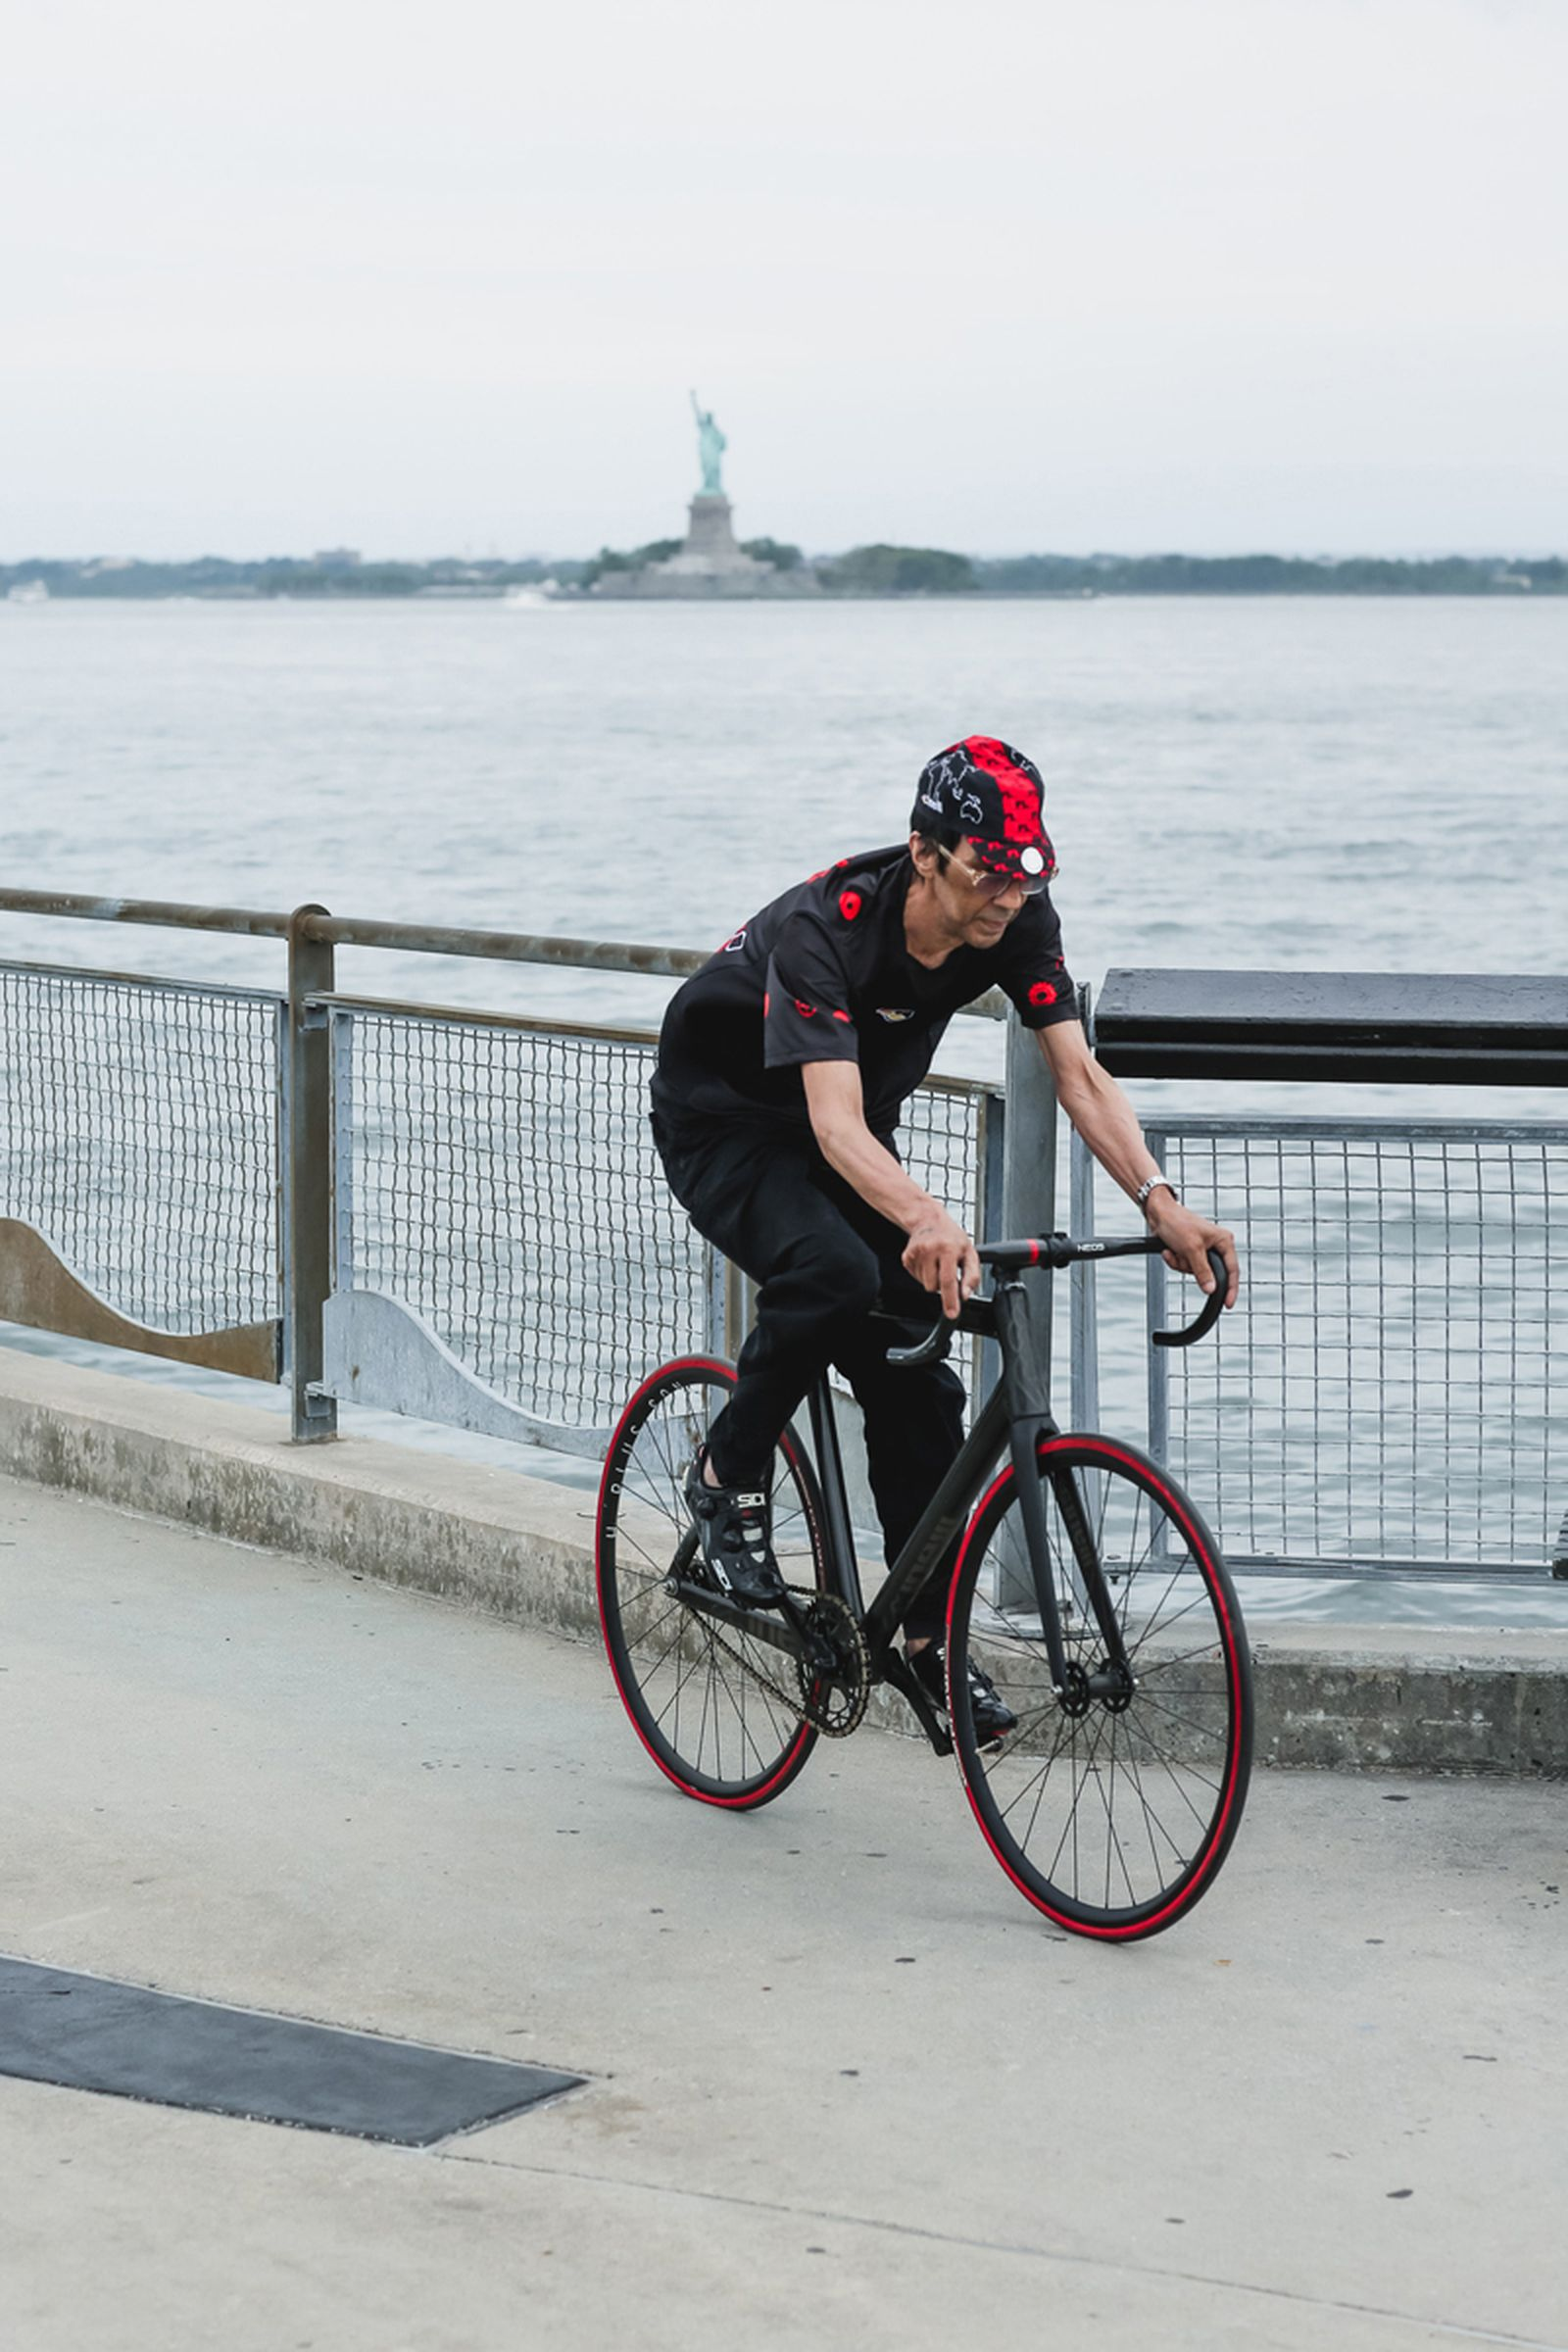 futura-cinelli-collab-apparel-bike (8)